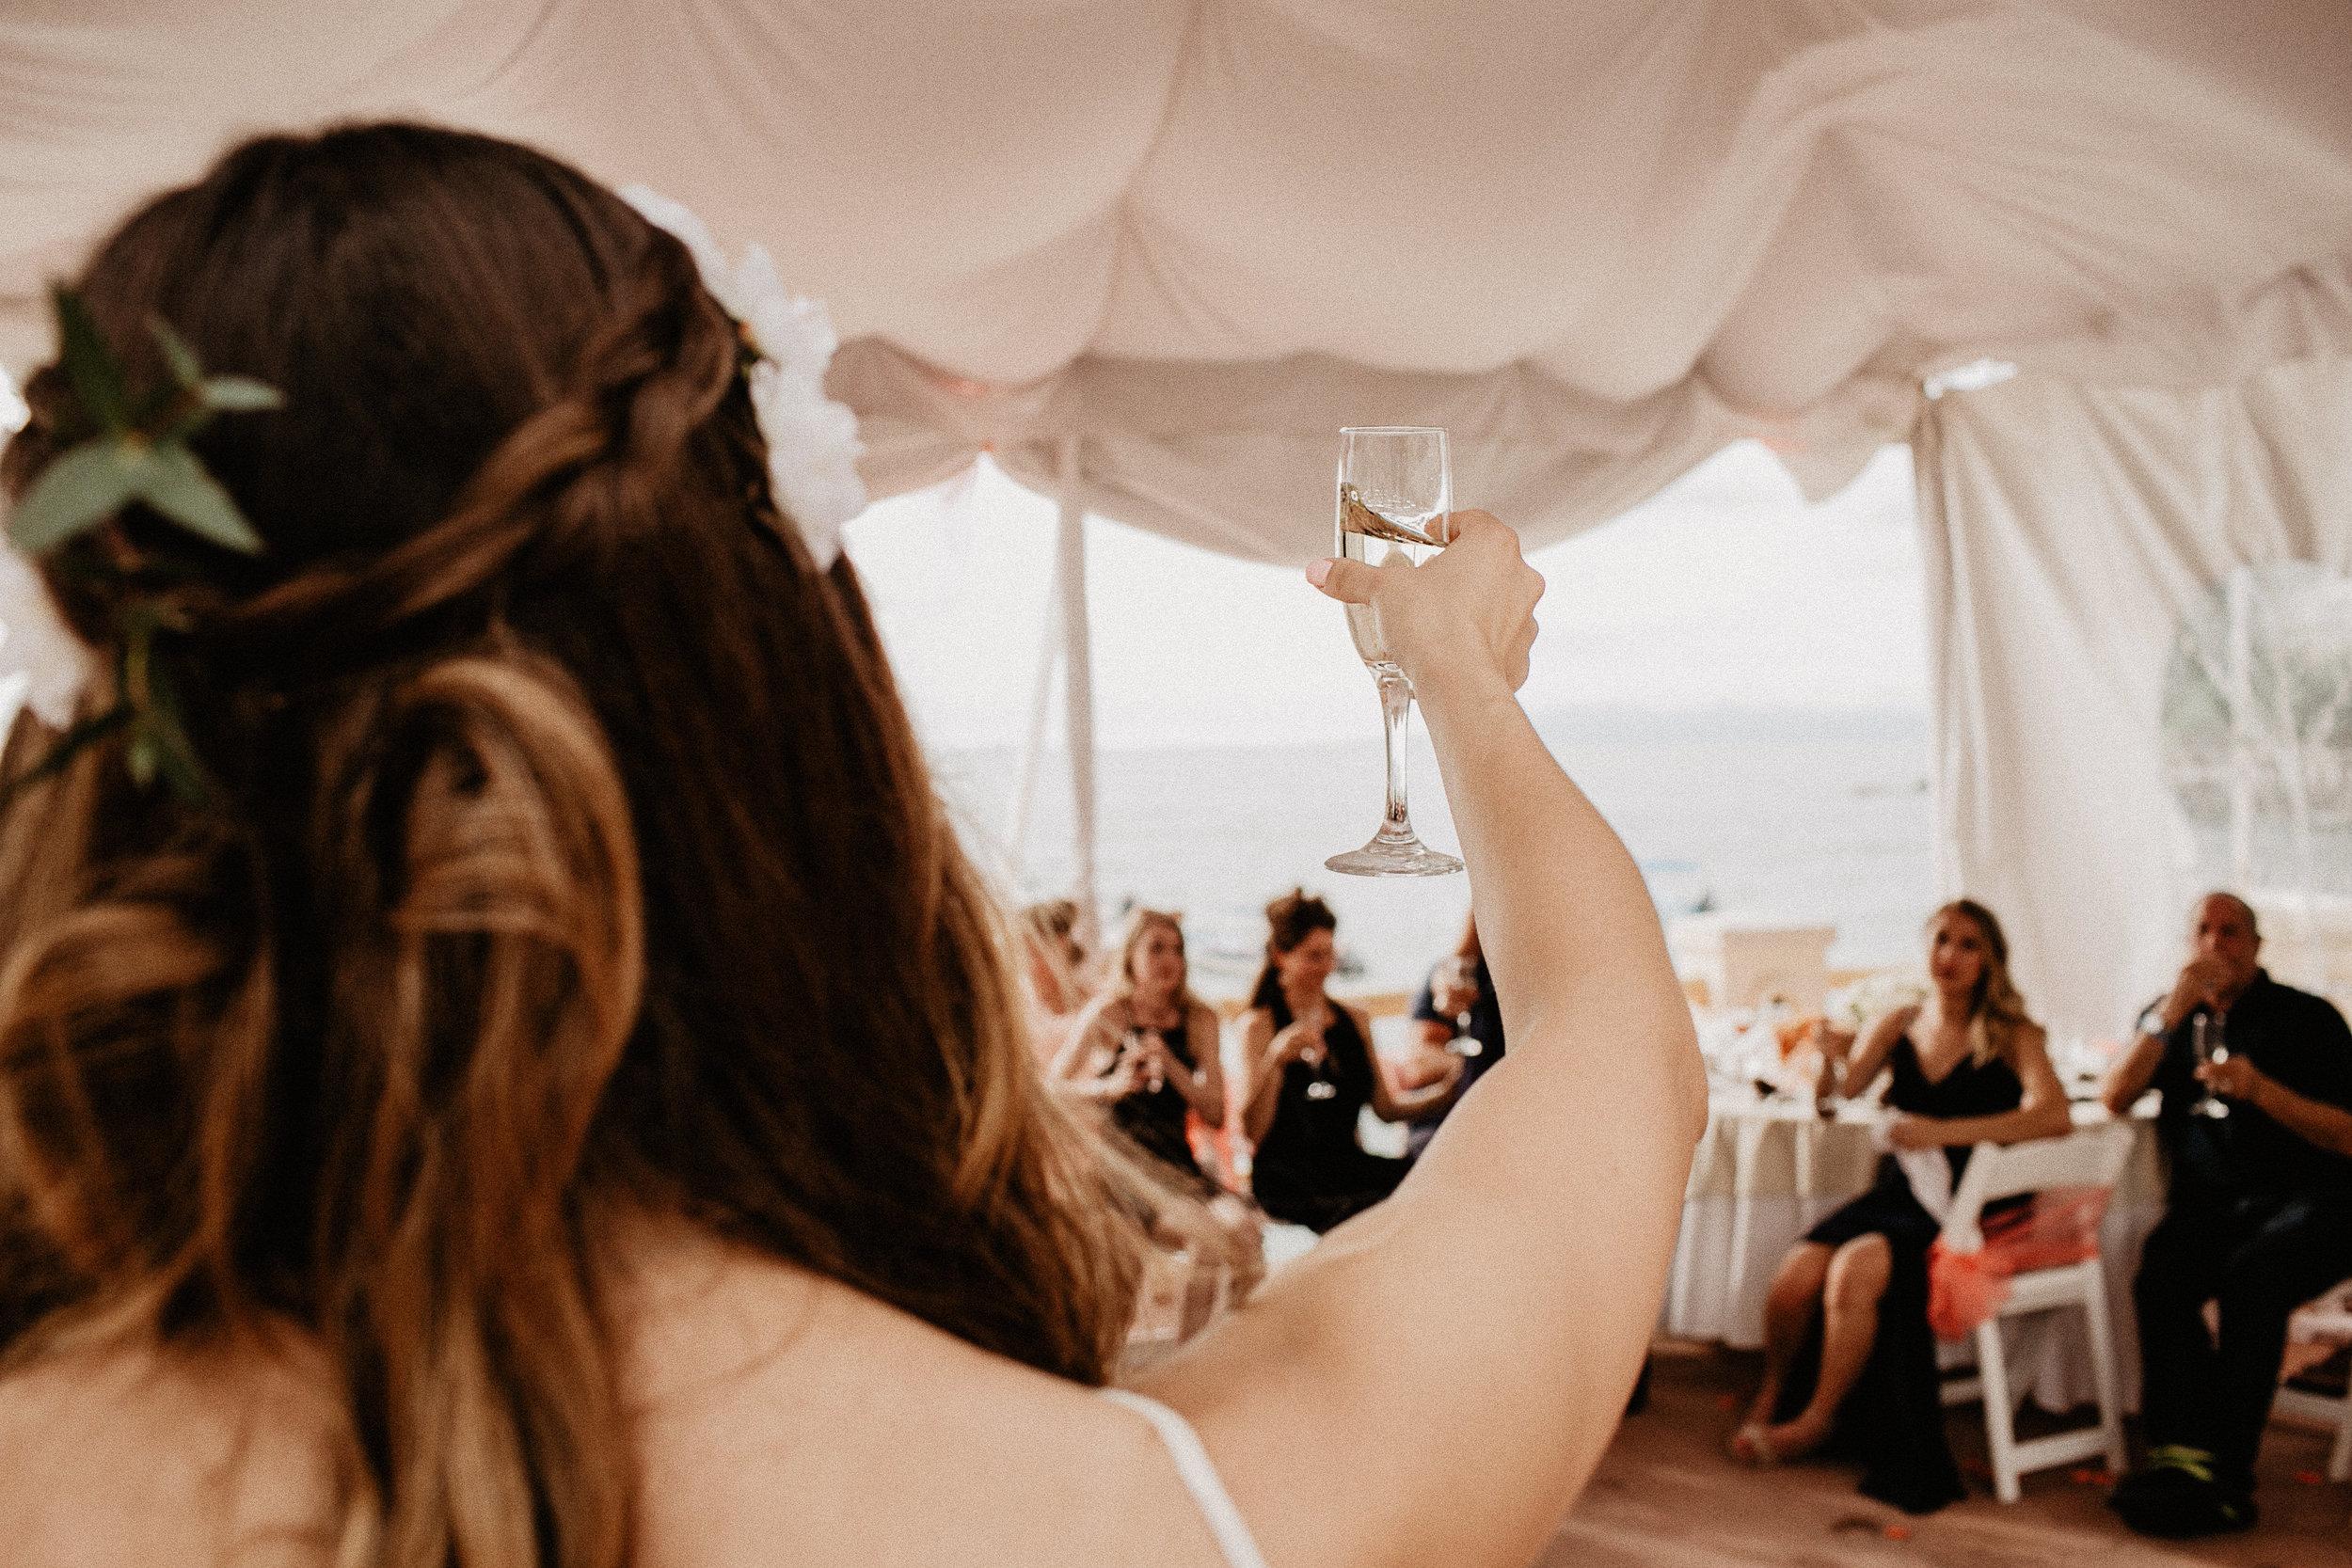 alfonso_flores_destination_wedding_photography_puerto_vallarta_hotel_barcelo_vallarta_cuttler_amela-631.JPG